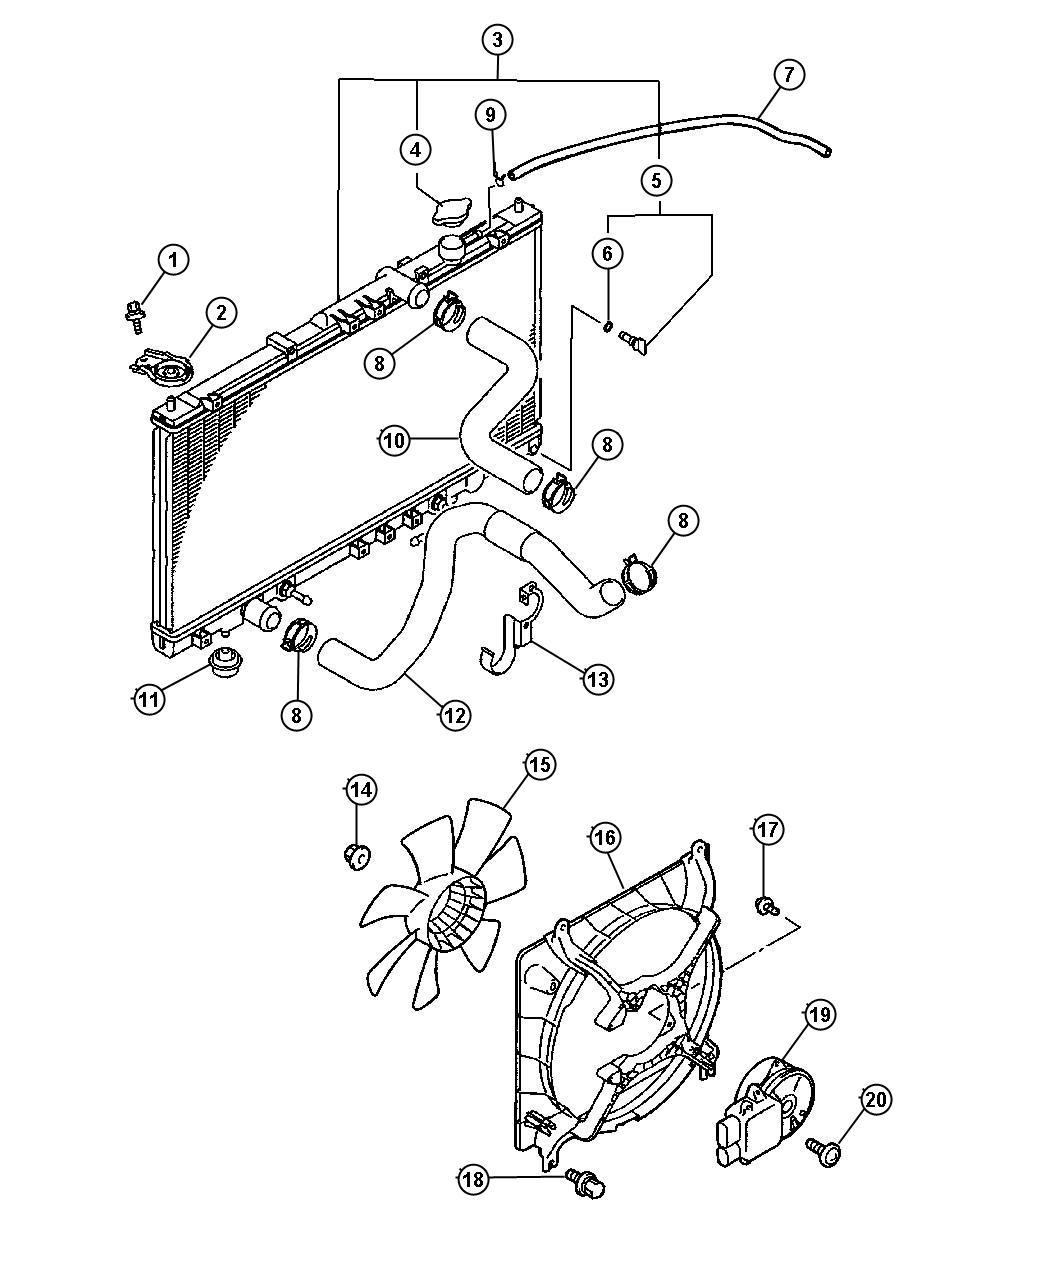 2001 Chrysler Sebring Radiator. Engine cooling. Magneti